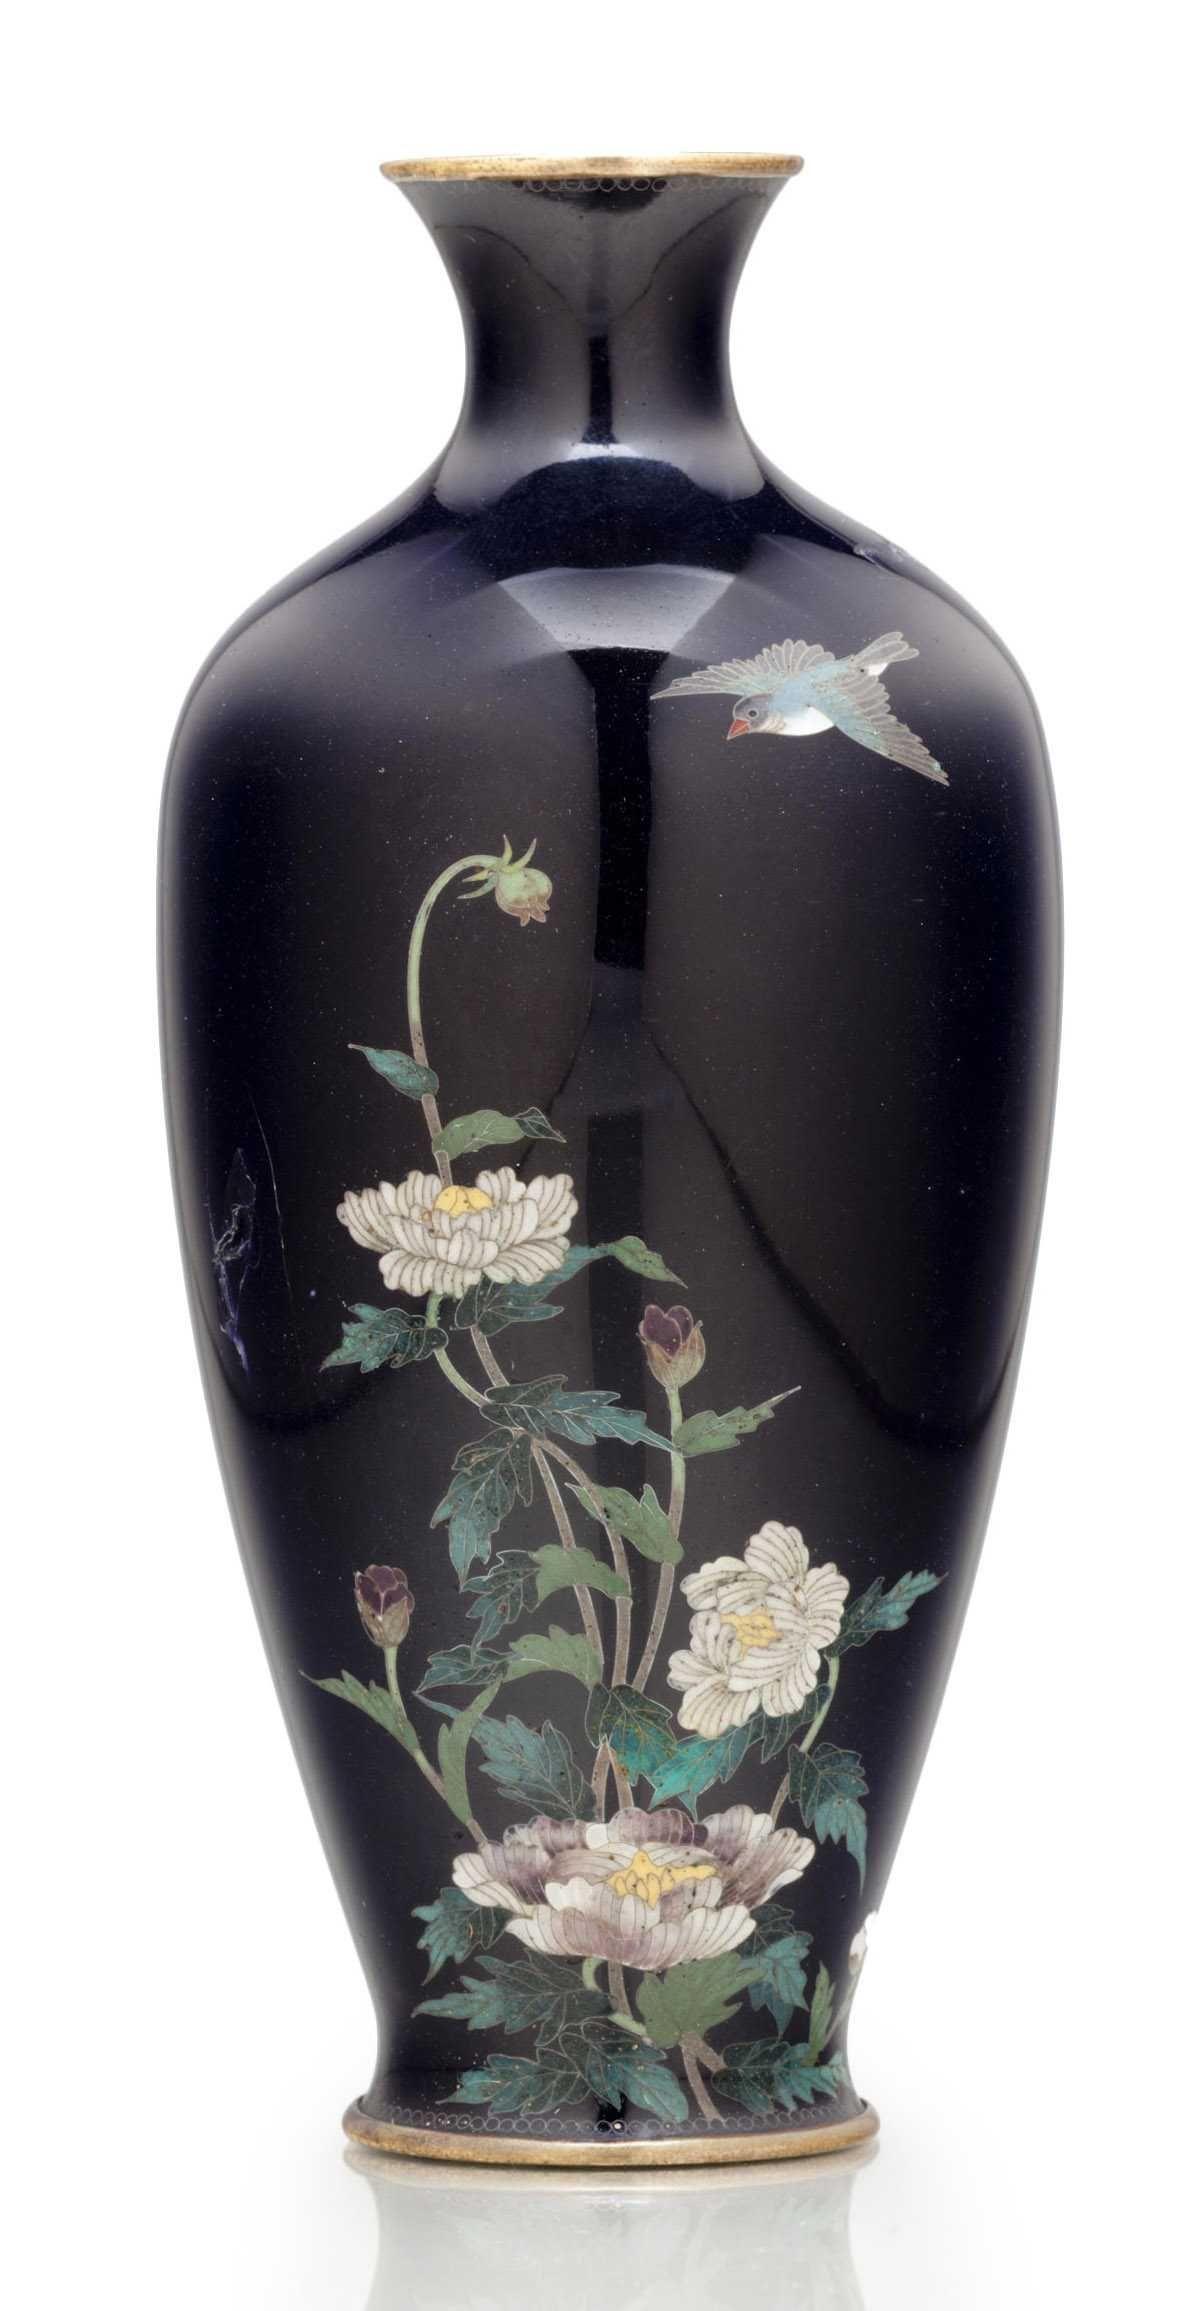 Cloisonn enamel vase christies japanese art meiji period cloisonn enamel vase christies japanese art meiji period reviewsmspy